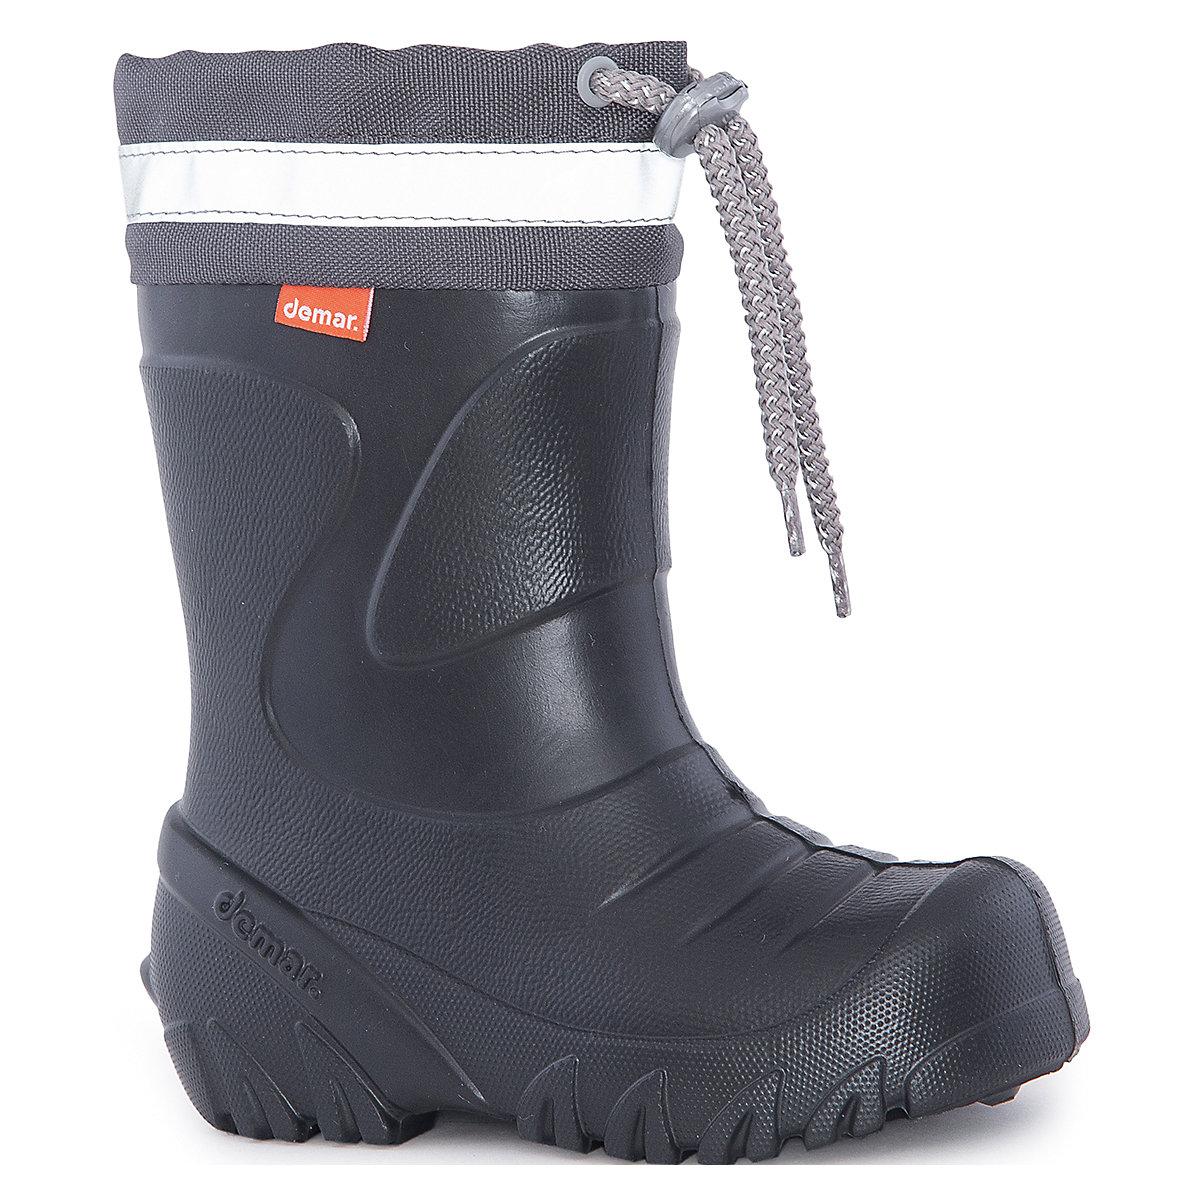 DEMAR Boots 4948841 boys All Seasons Rubber Children shoes boy demar boots 4948841 boys all seasons rubber baby shoes boy